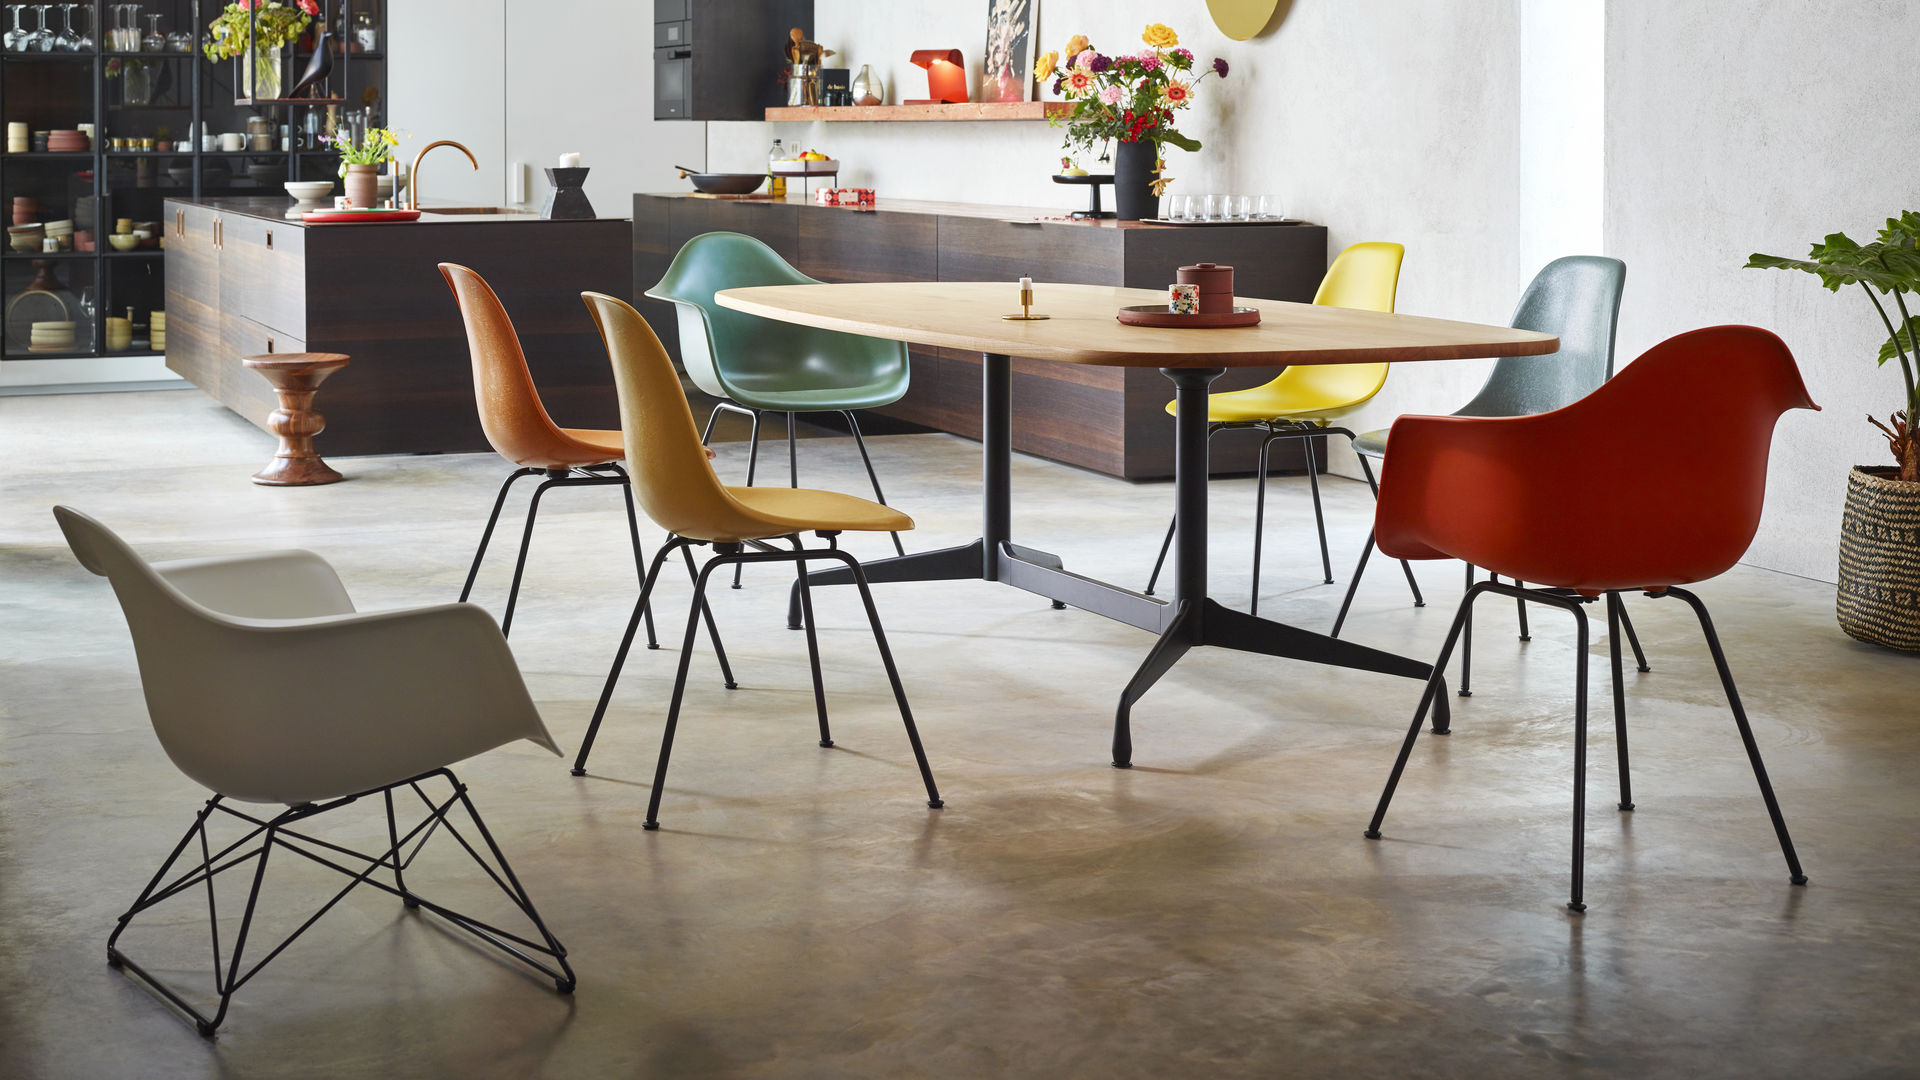 Eames Segmented Tables Dining Eames Plastic Chair Eames Fiberglass Chair Eames Plastic Armchair_web_16-9